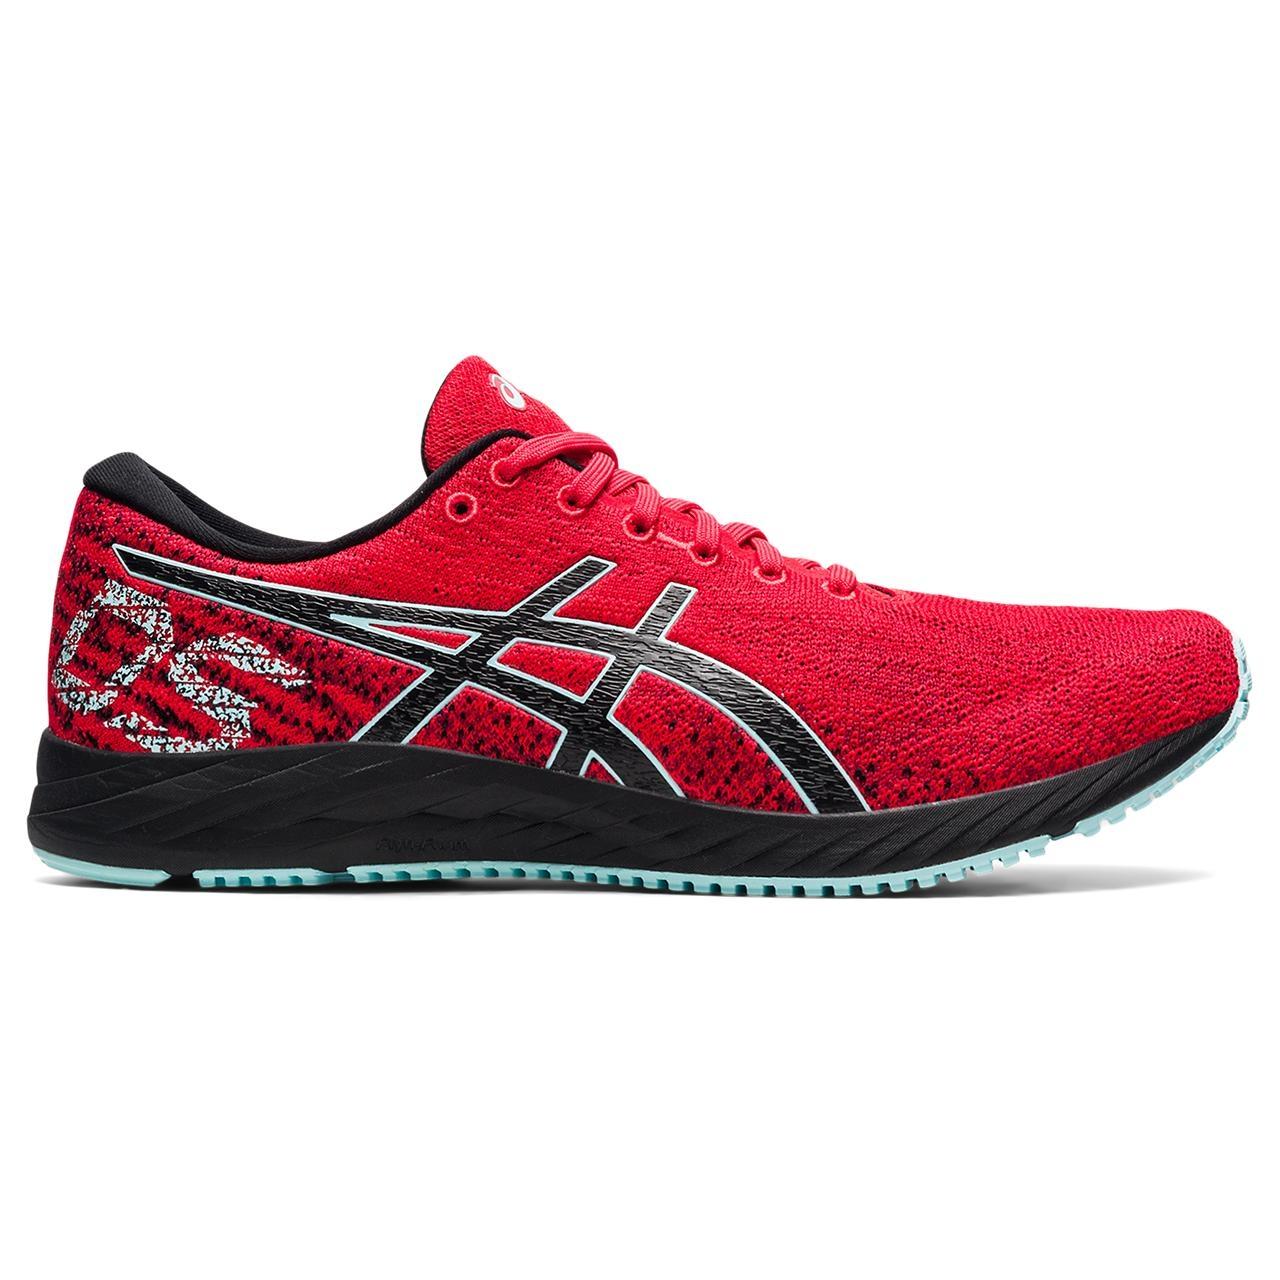 asics GEL-DS Trainer 26 Zapatillas de Correr - electric red/black